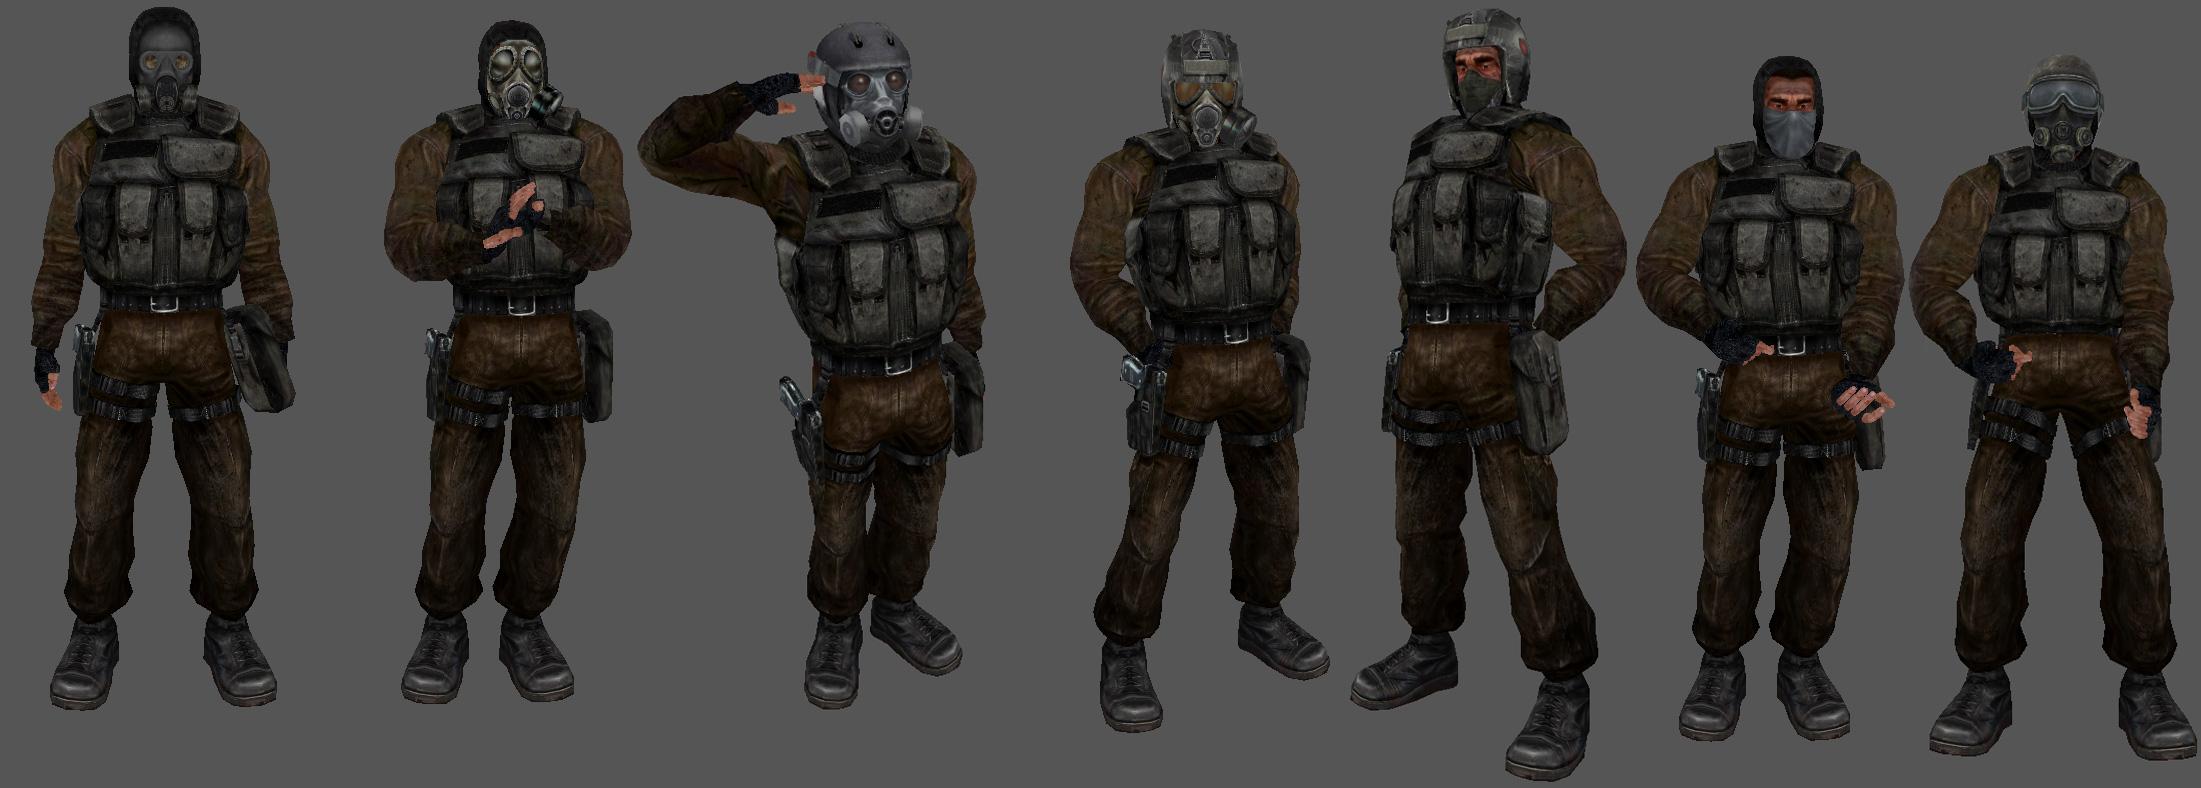 stalker clear sky how to repair armor